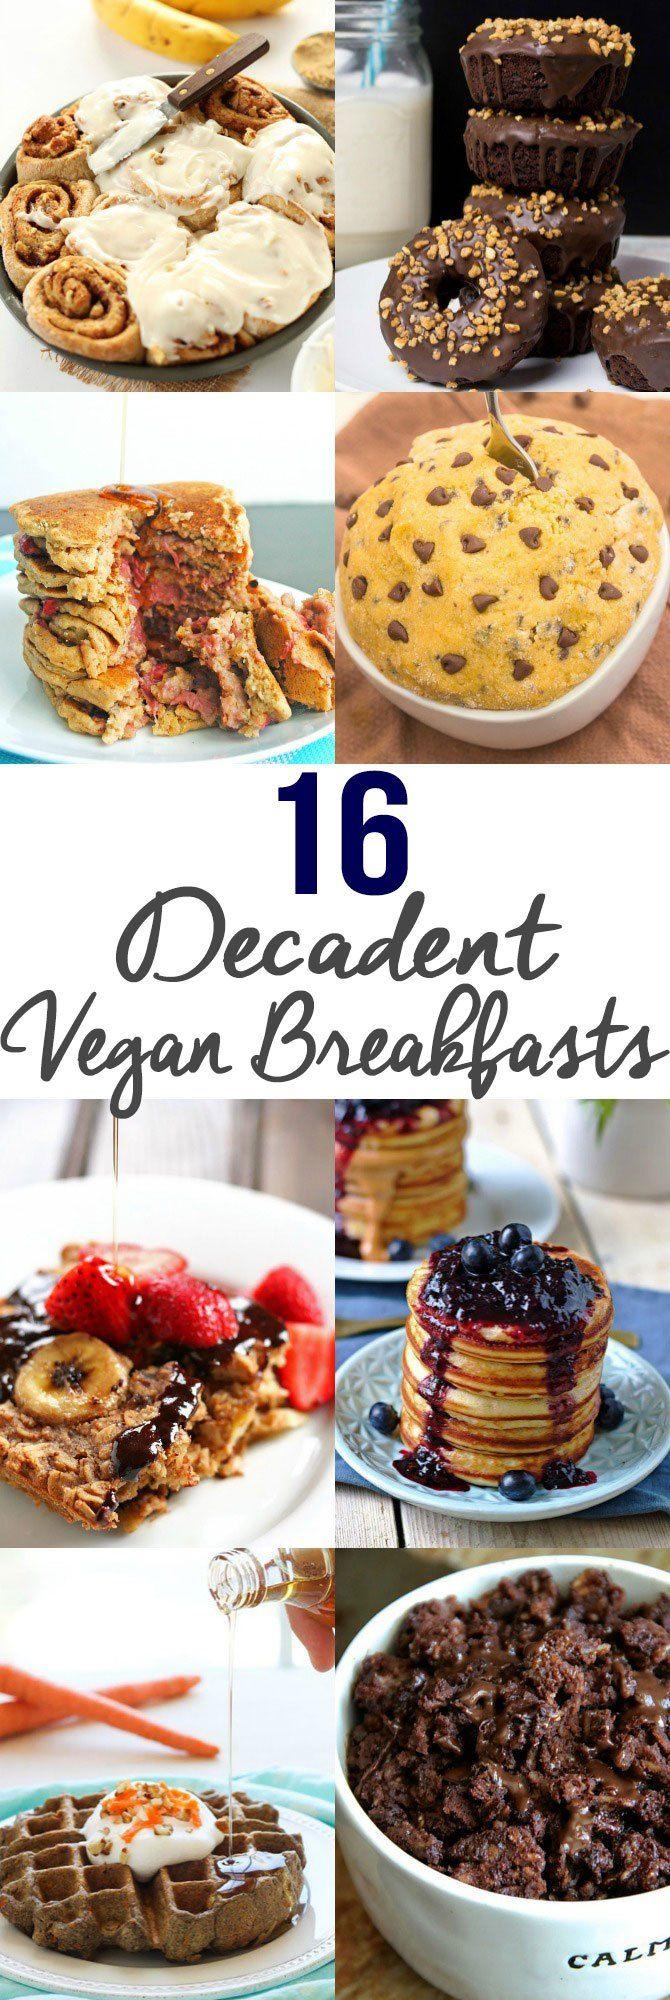 16 Decadent Vegan Breakfast Recipes